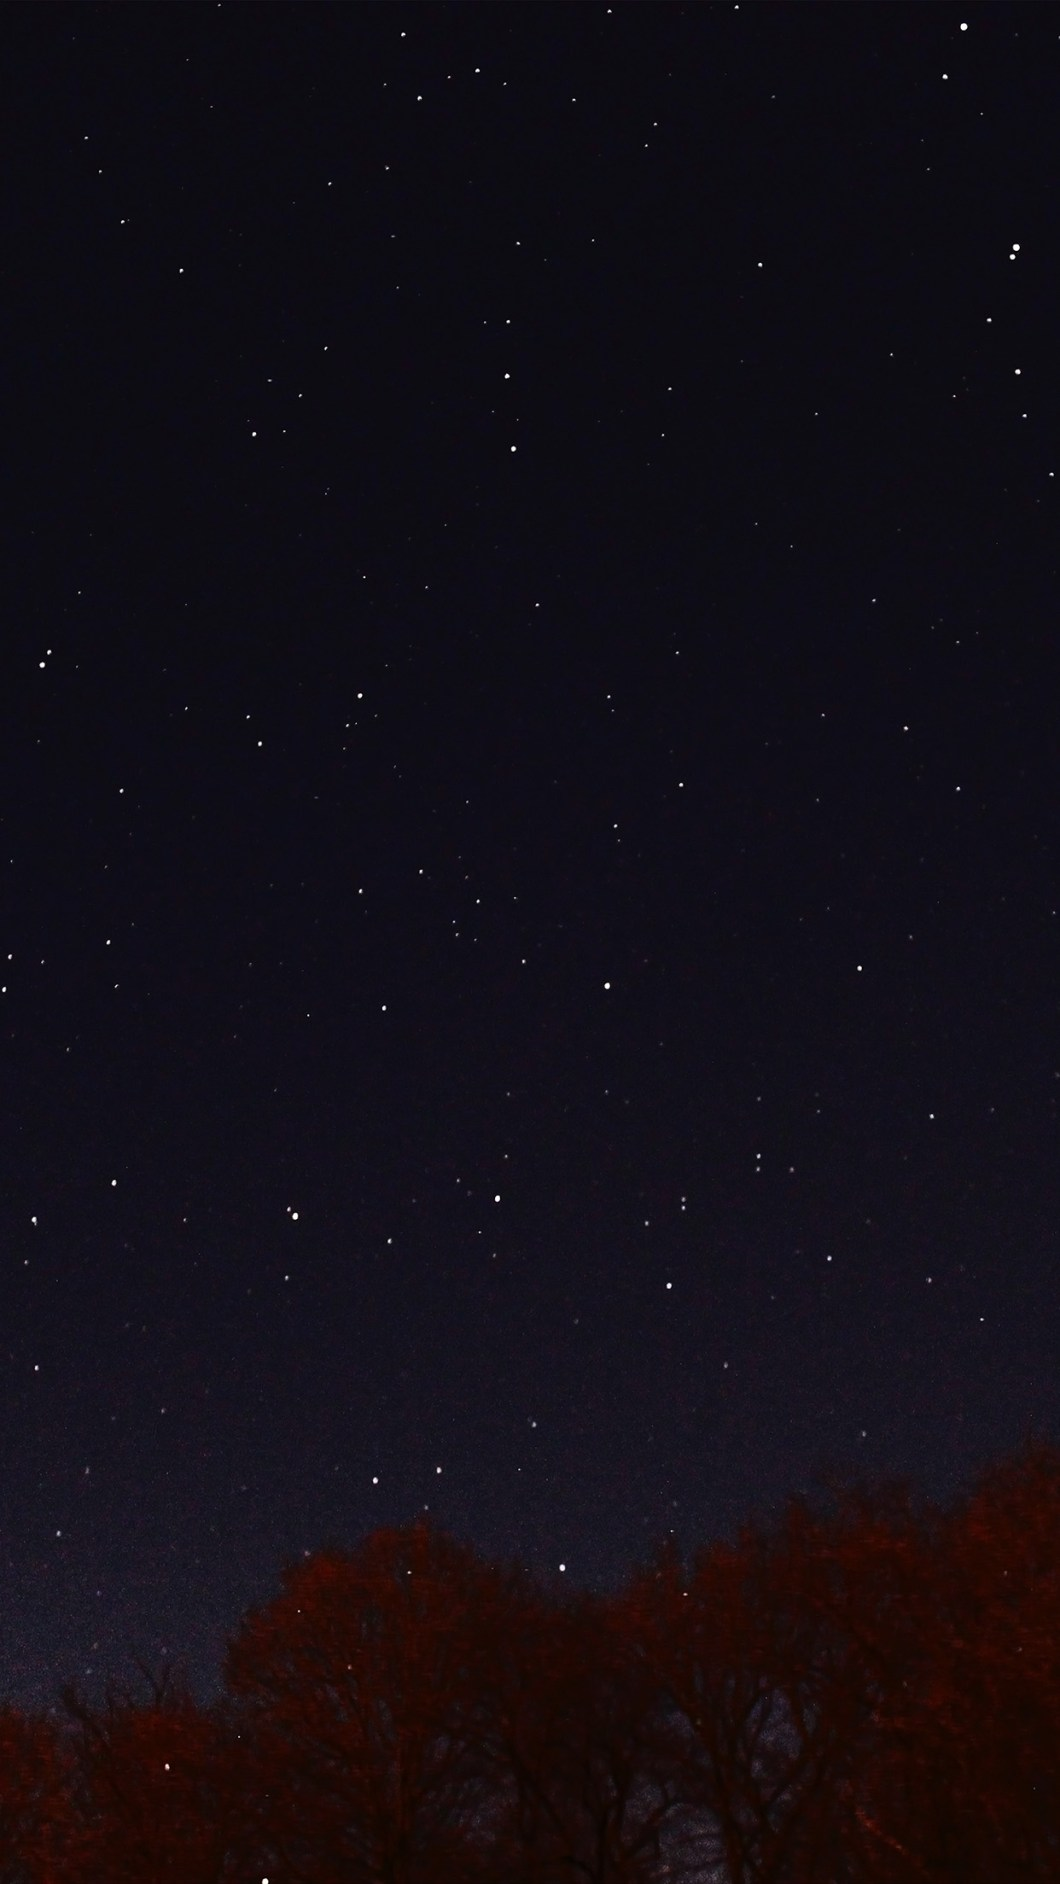 Kumpulan Wallpaper Android Hd Dark Sky HD Paling Keren